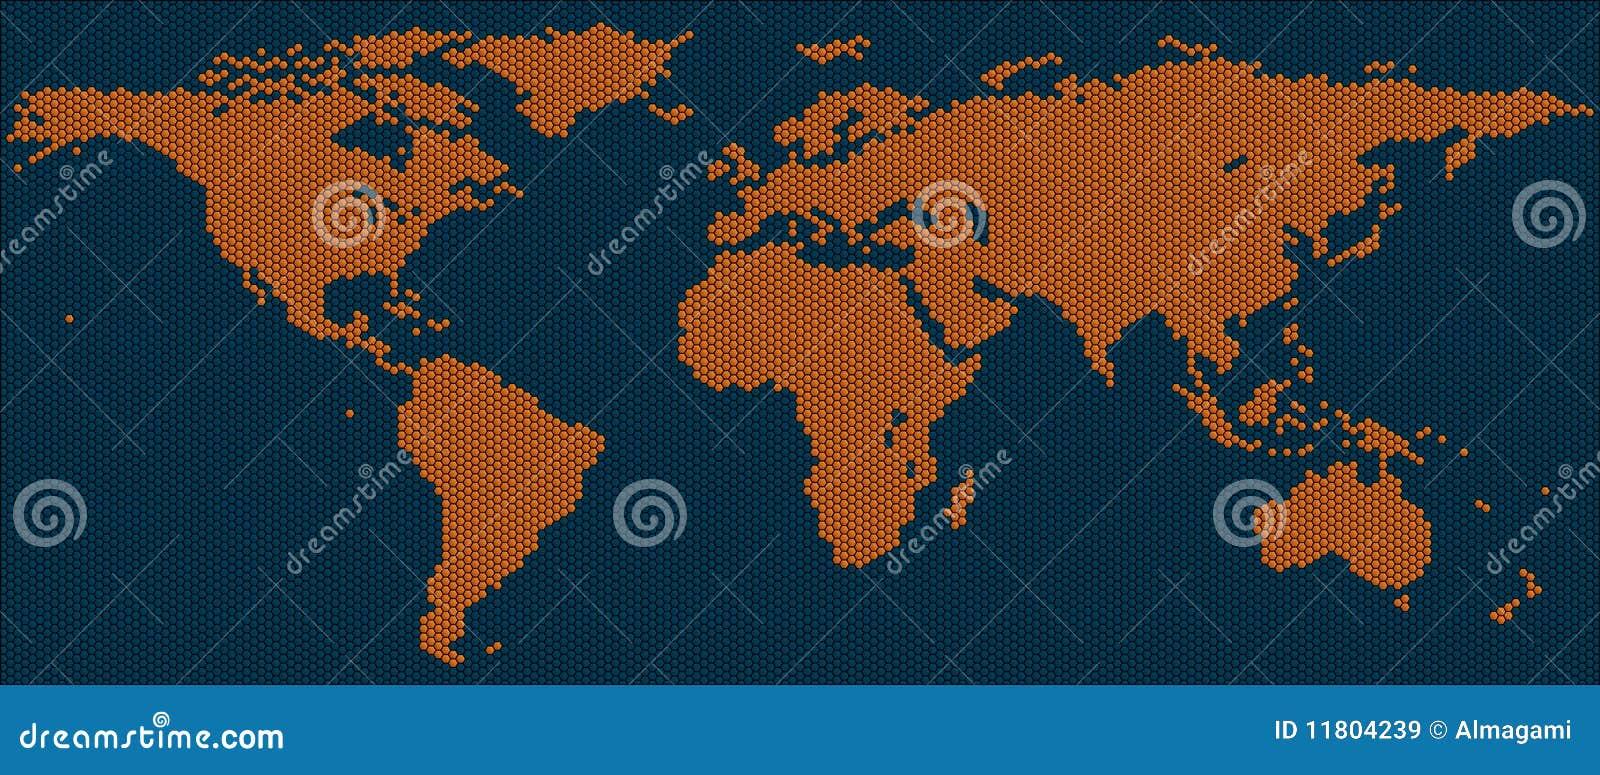 World Map Of Hexagon Tiles Stock Illustration